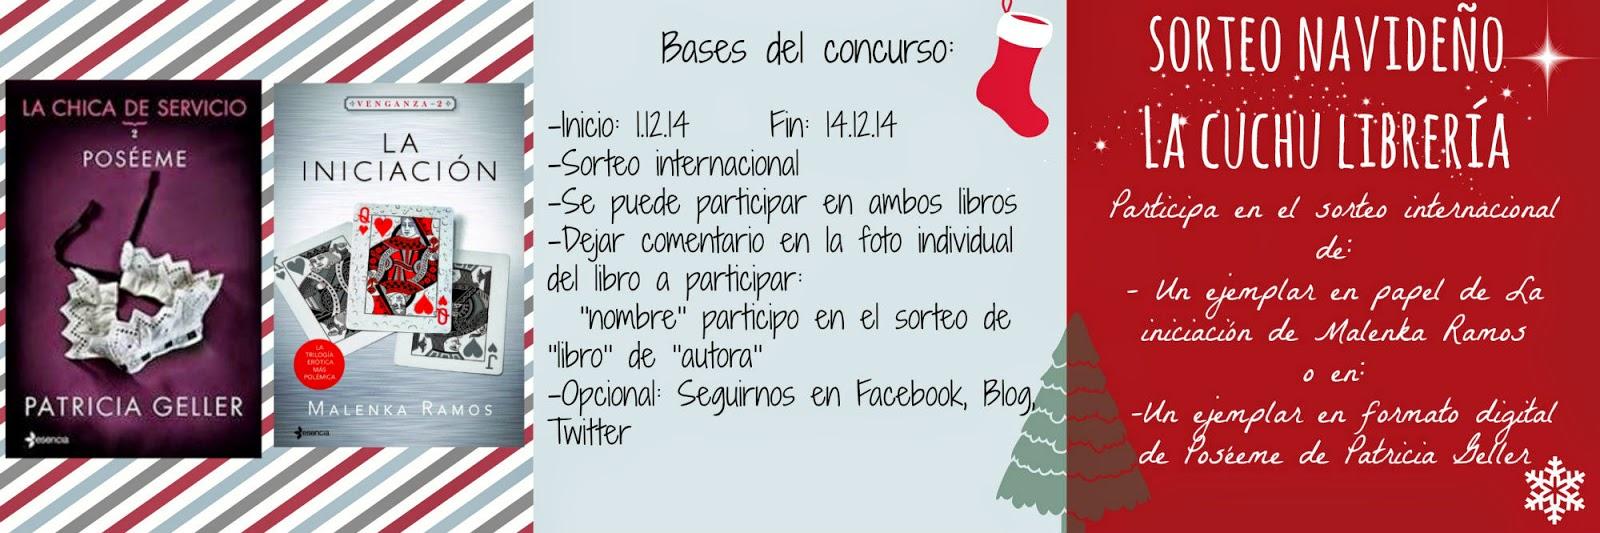 http://lacuchulibreria.blogspot.com.es/2014/11/sorteo-navideno_30.html